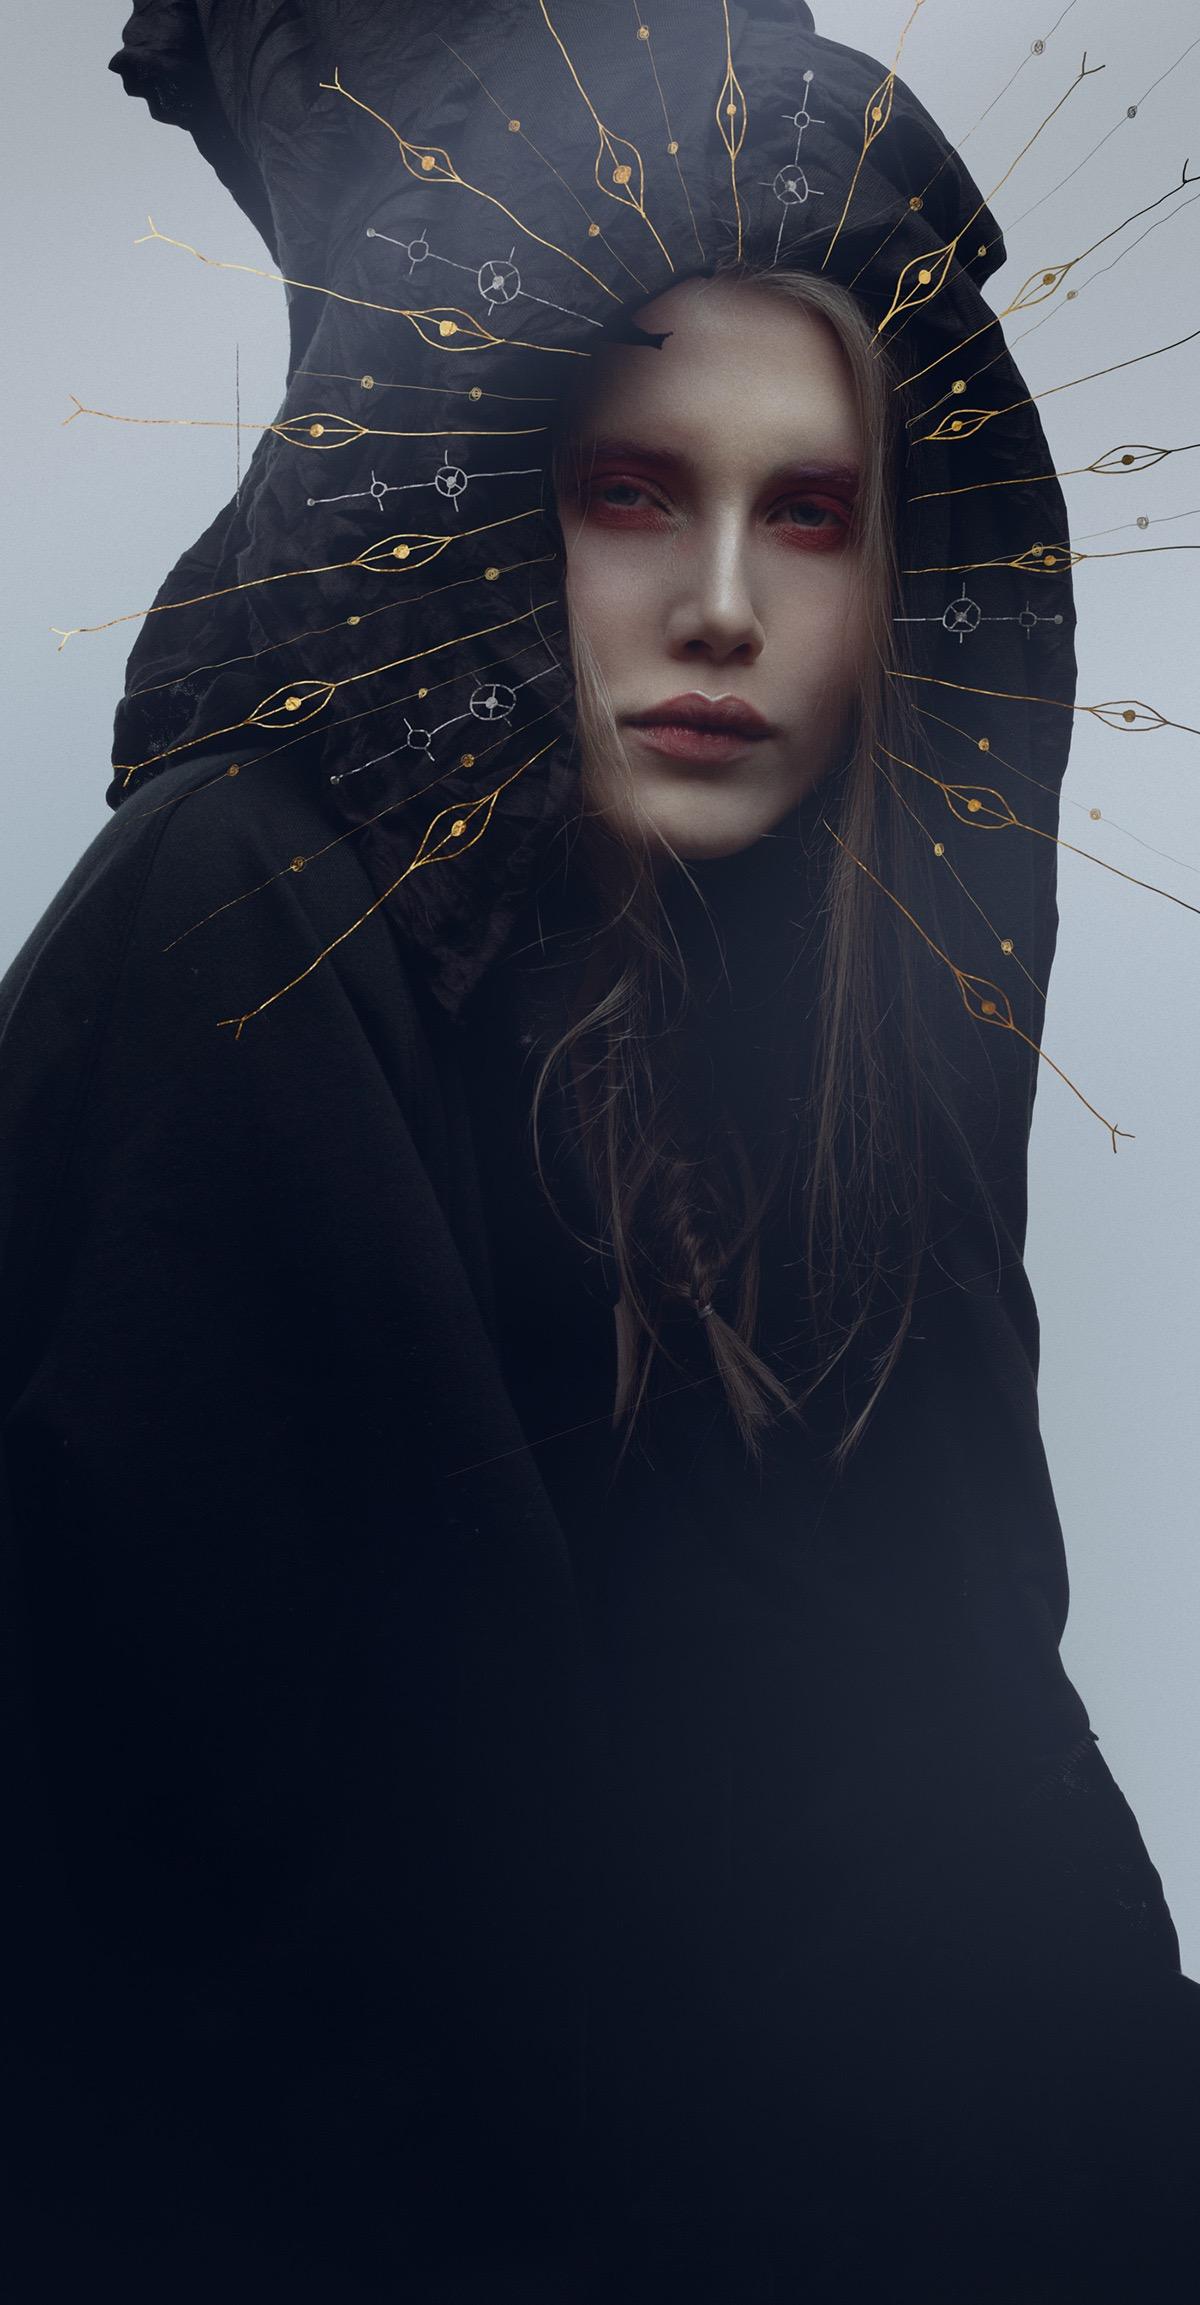 Alexander Berdin-Lazursky, photography, photo manipulation, fashion, dark, obscure